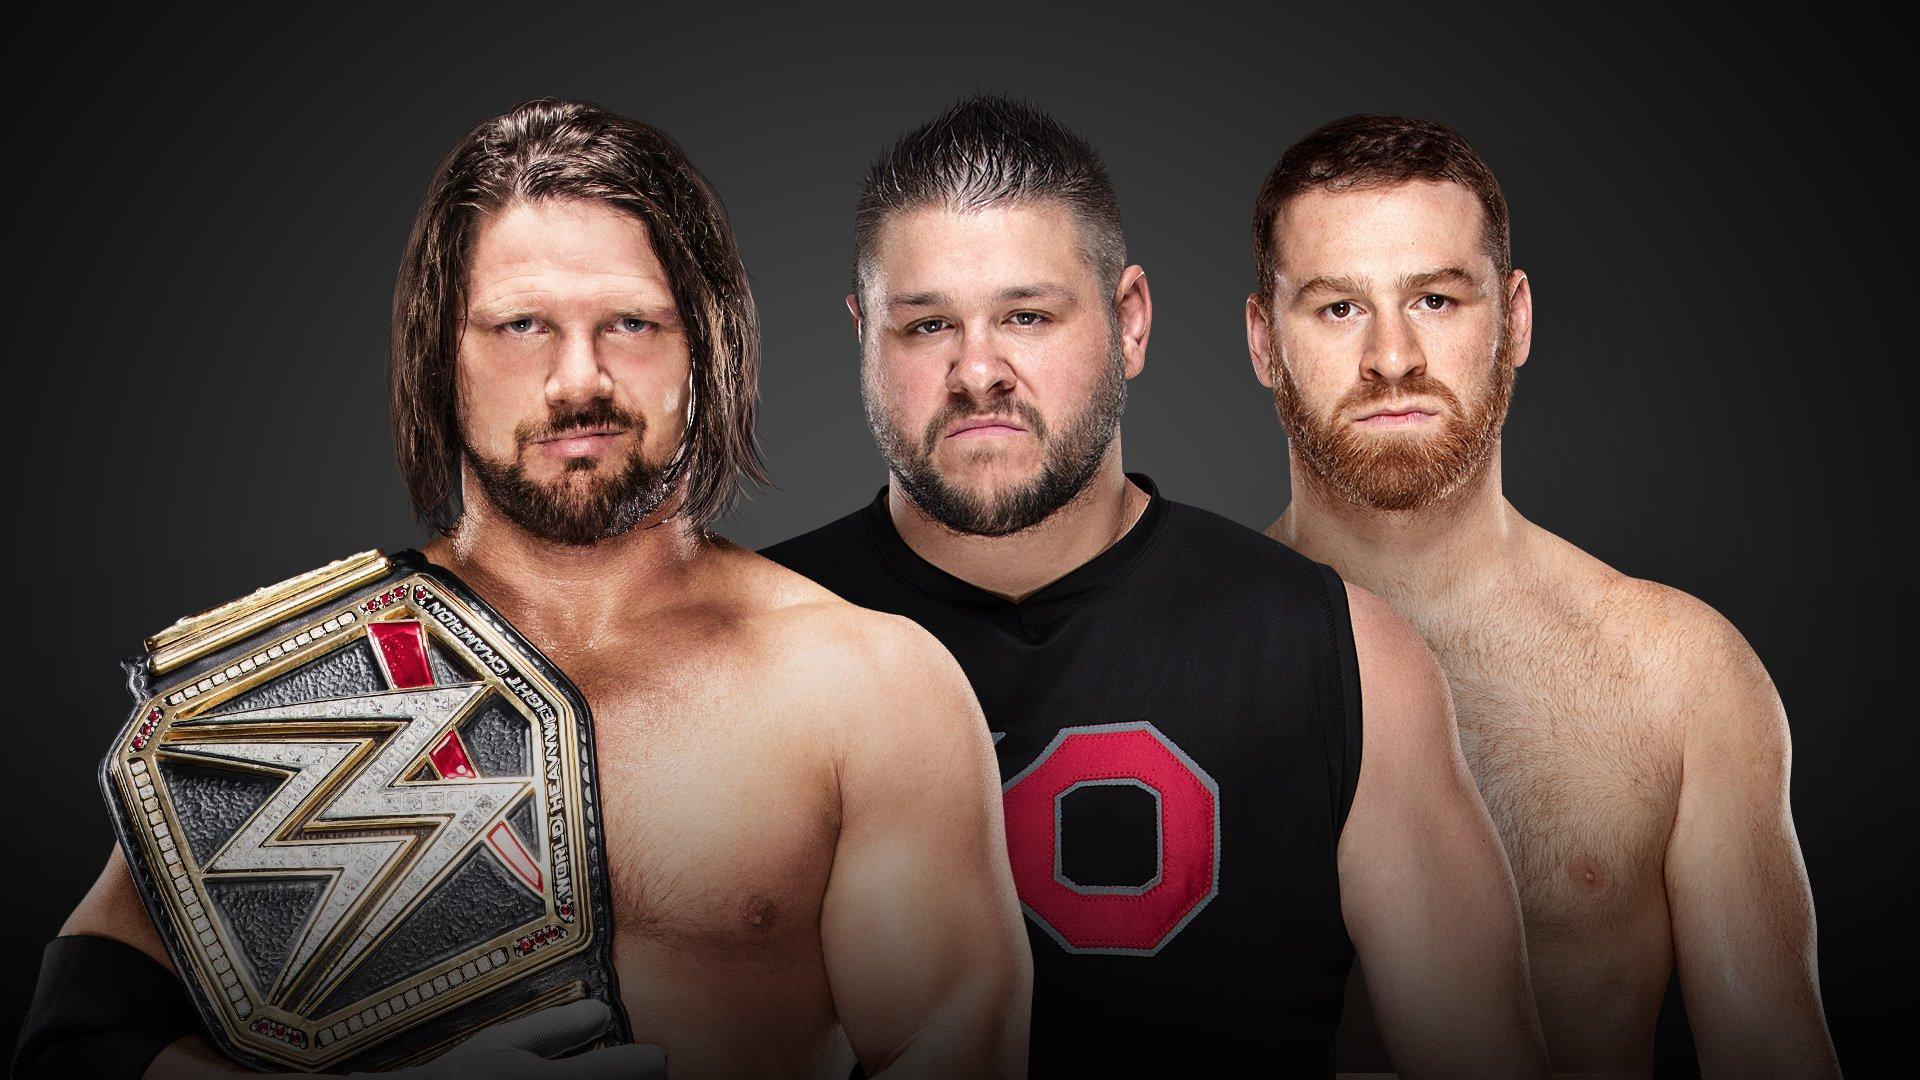 AJ Styles vs Kevin Owens et Sami Zayn - 2-on-1 Handicap Match